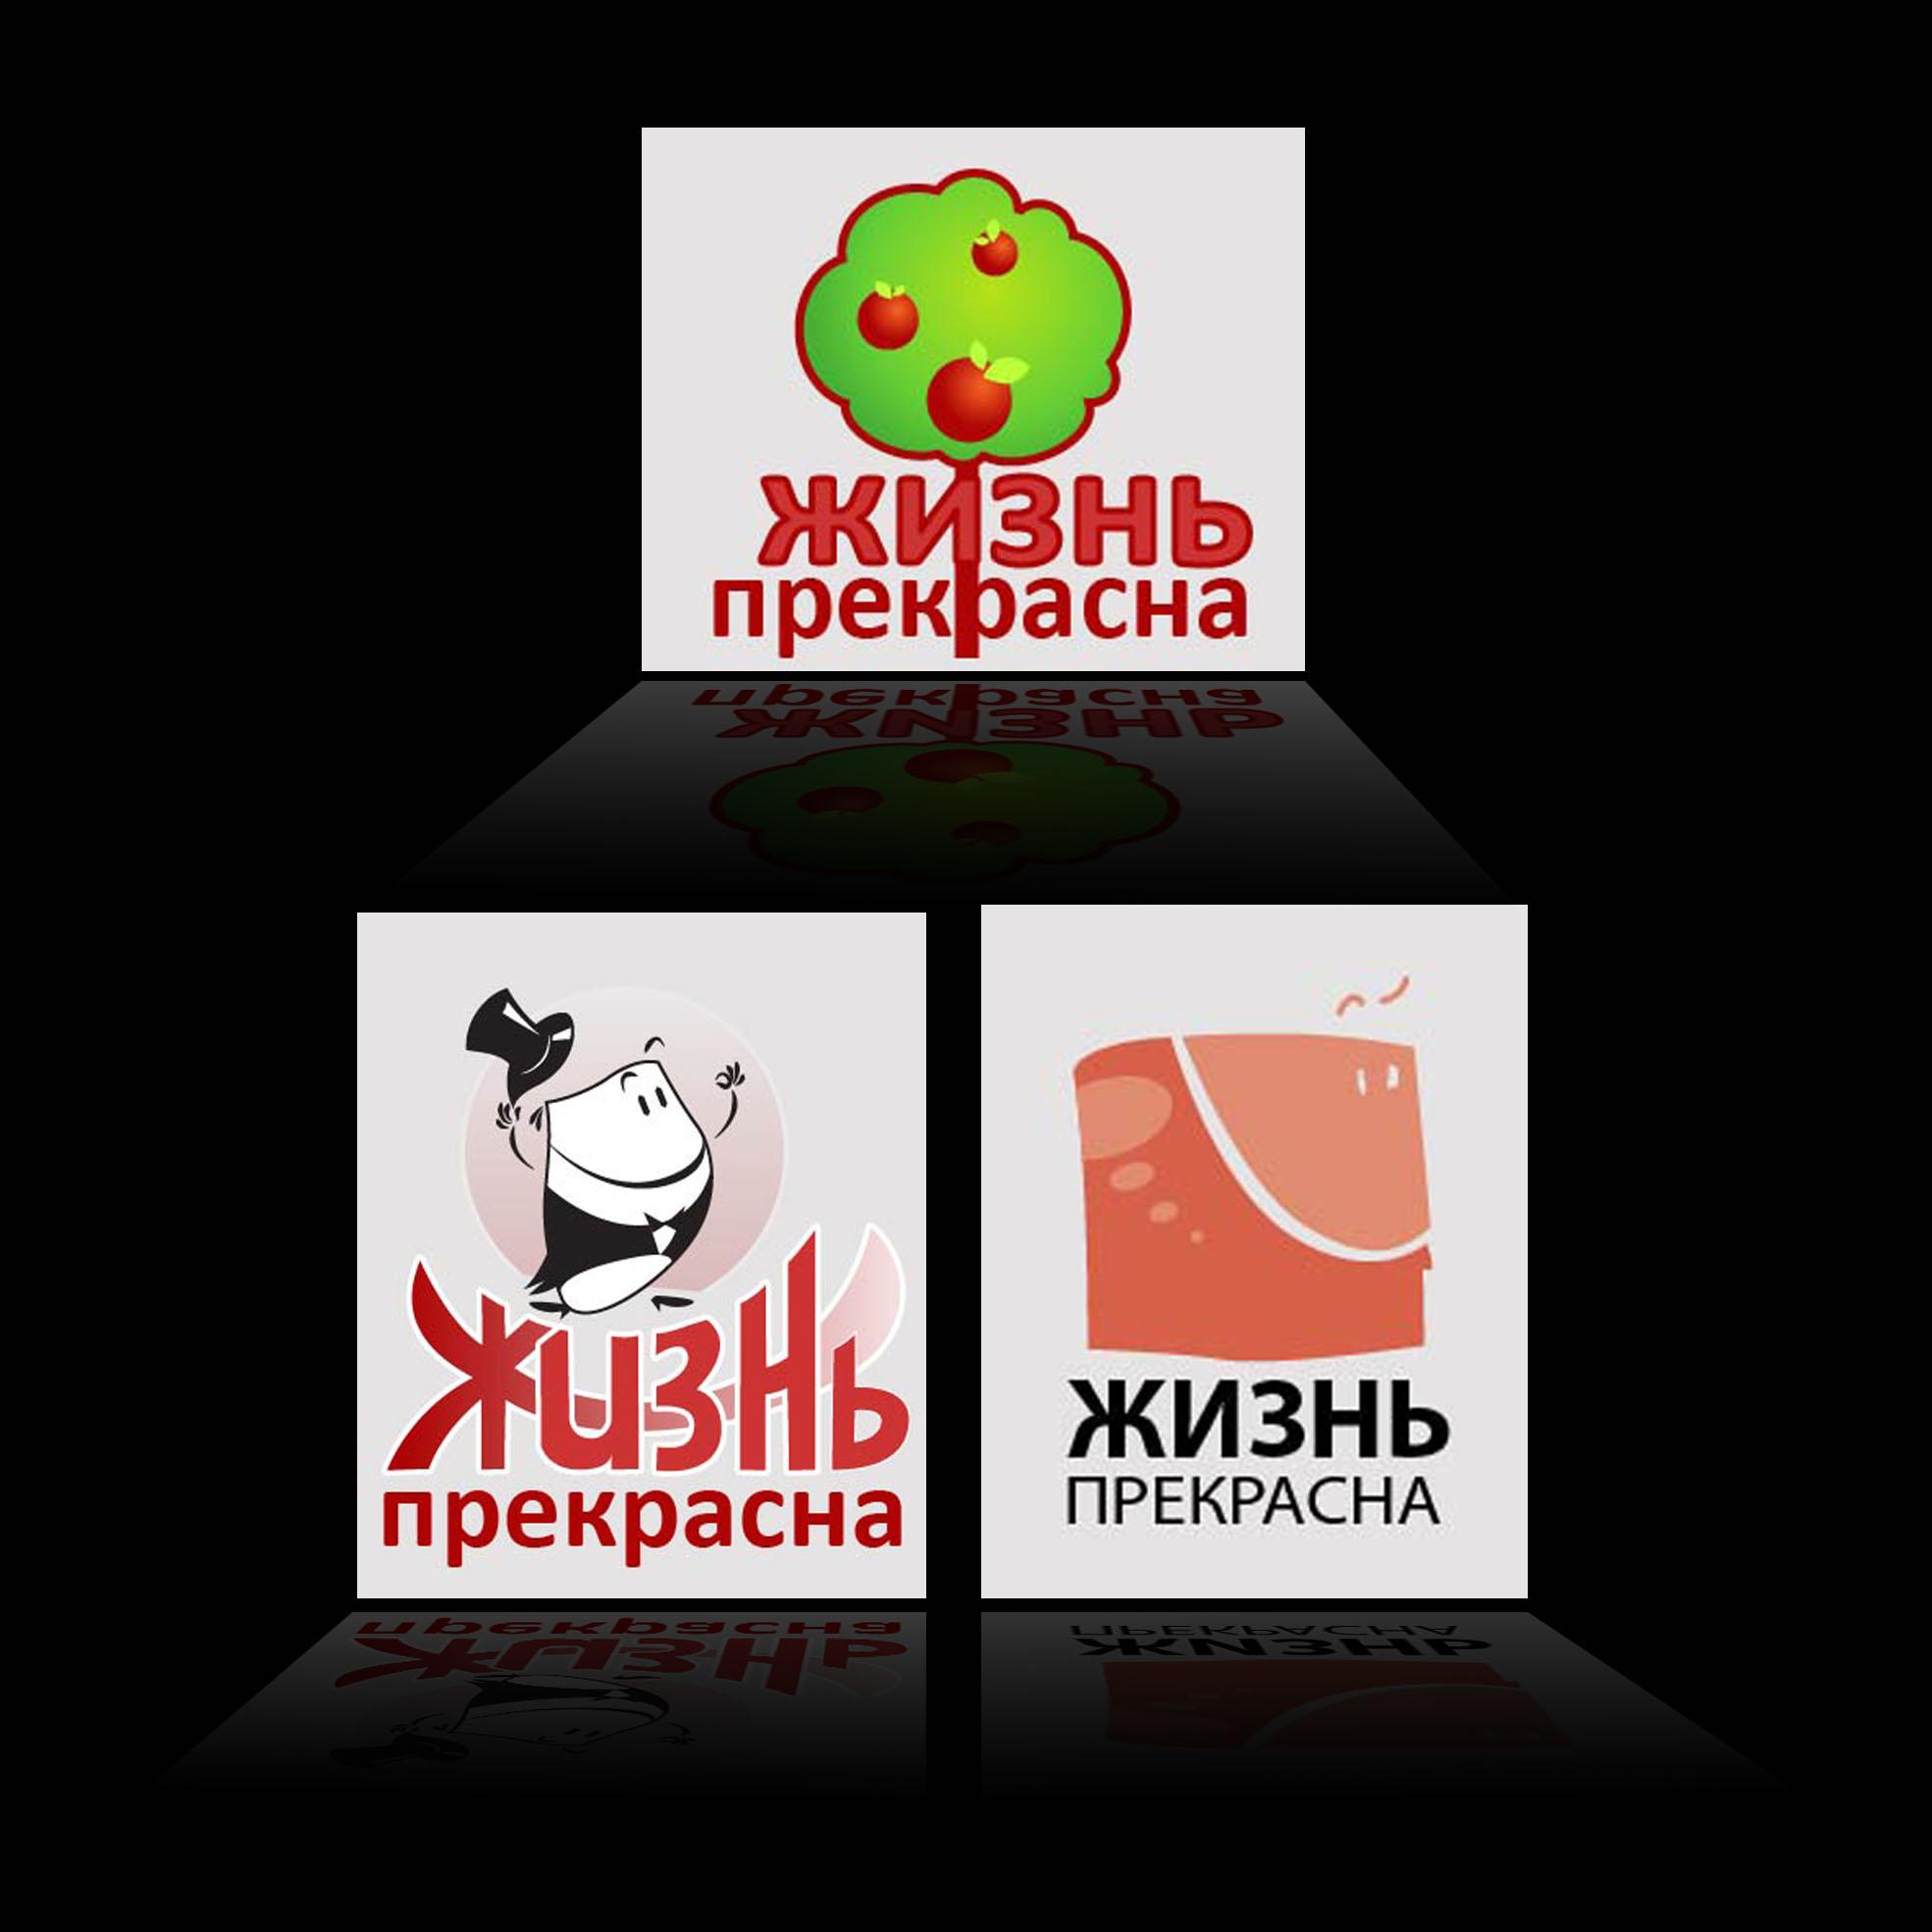 конкурсное лого